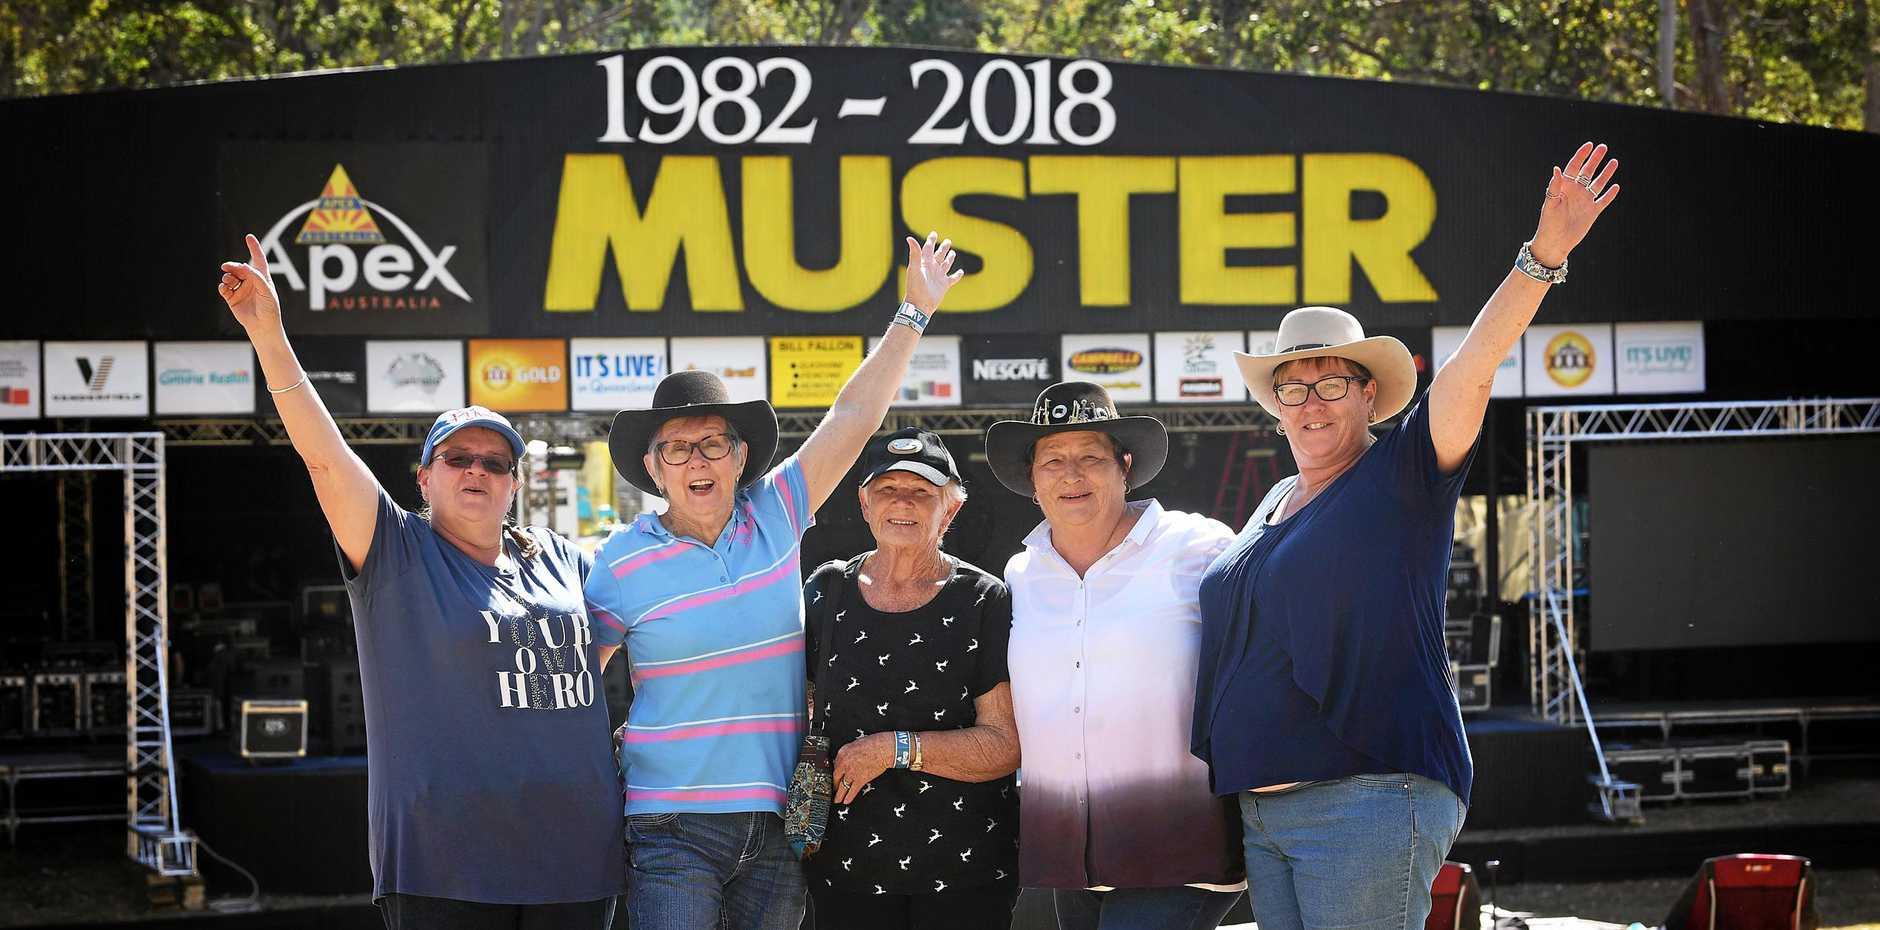 LIFELONG FRIENDS: Lindy Caldwell, Lyn Wray, Gwenda Caldwell, Lynn Hogan and Kerri Midolo at the 2018 Gympie Muster yesterday.